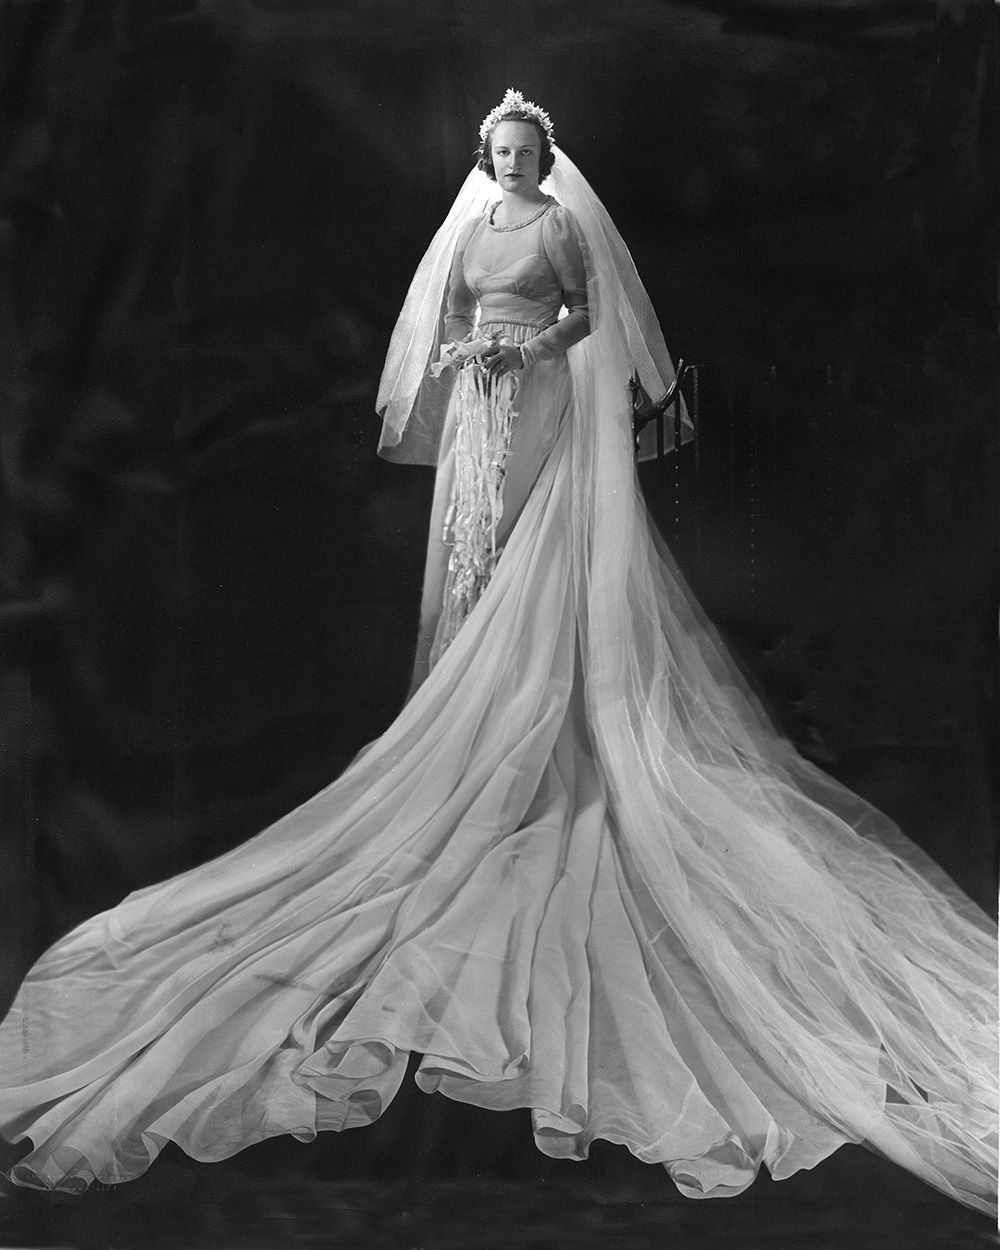 Vintage Bride Dramatic Bridal Portrait 1938 Helen Charles